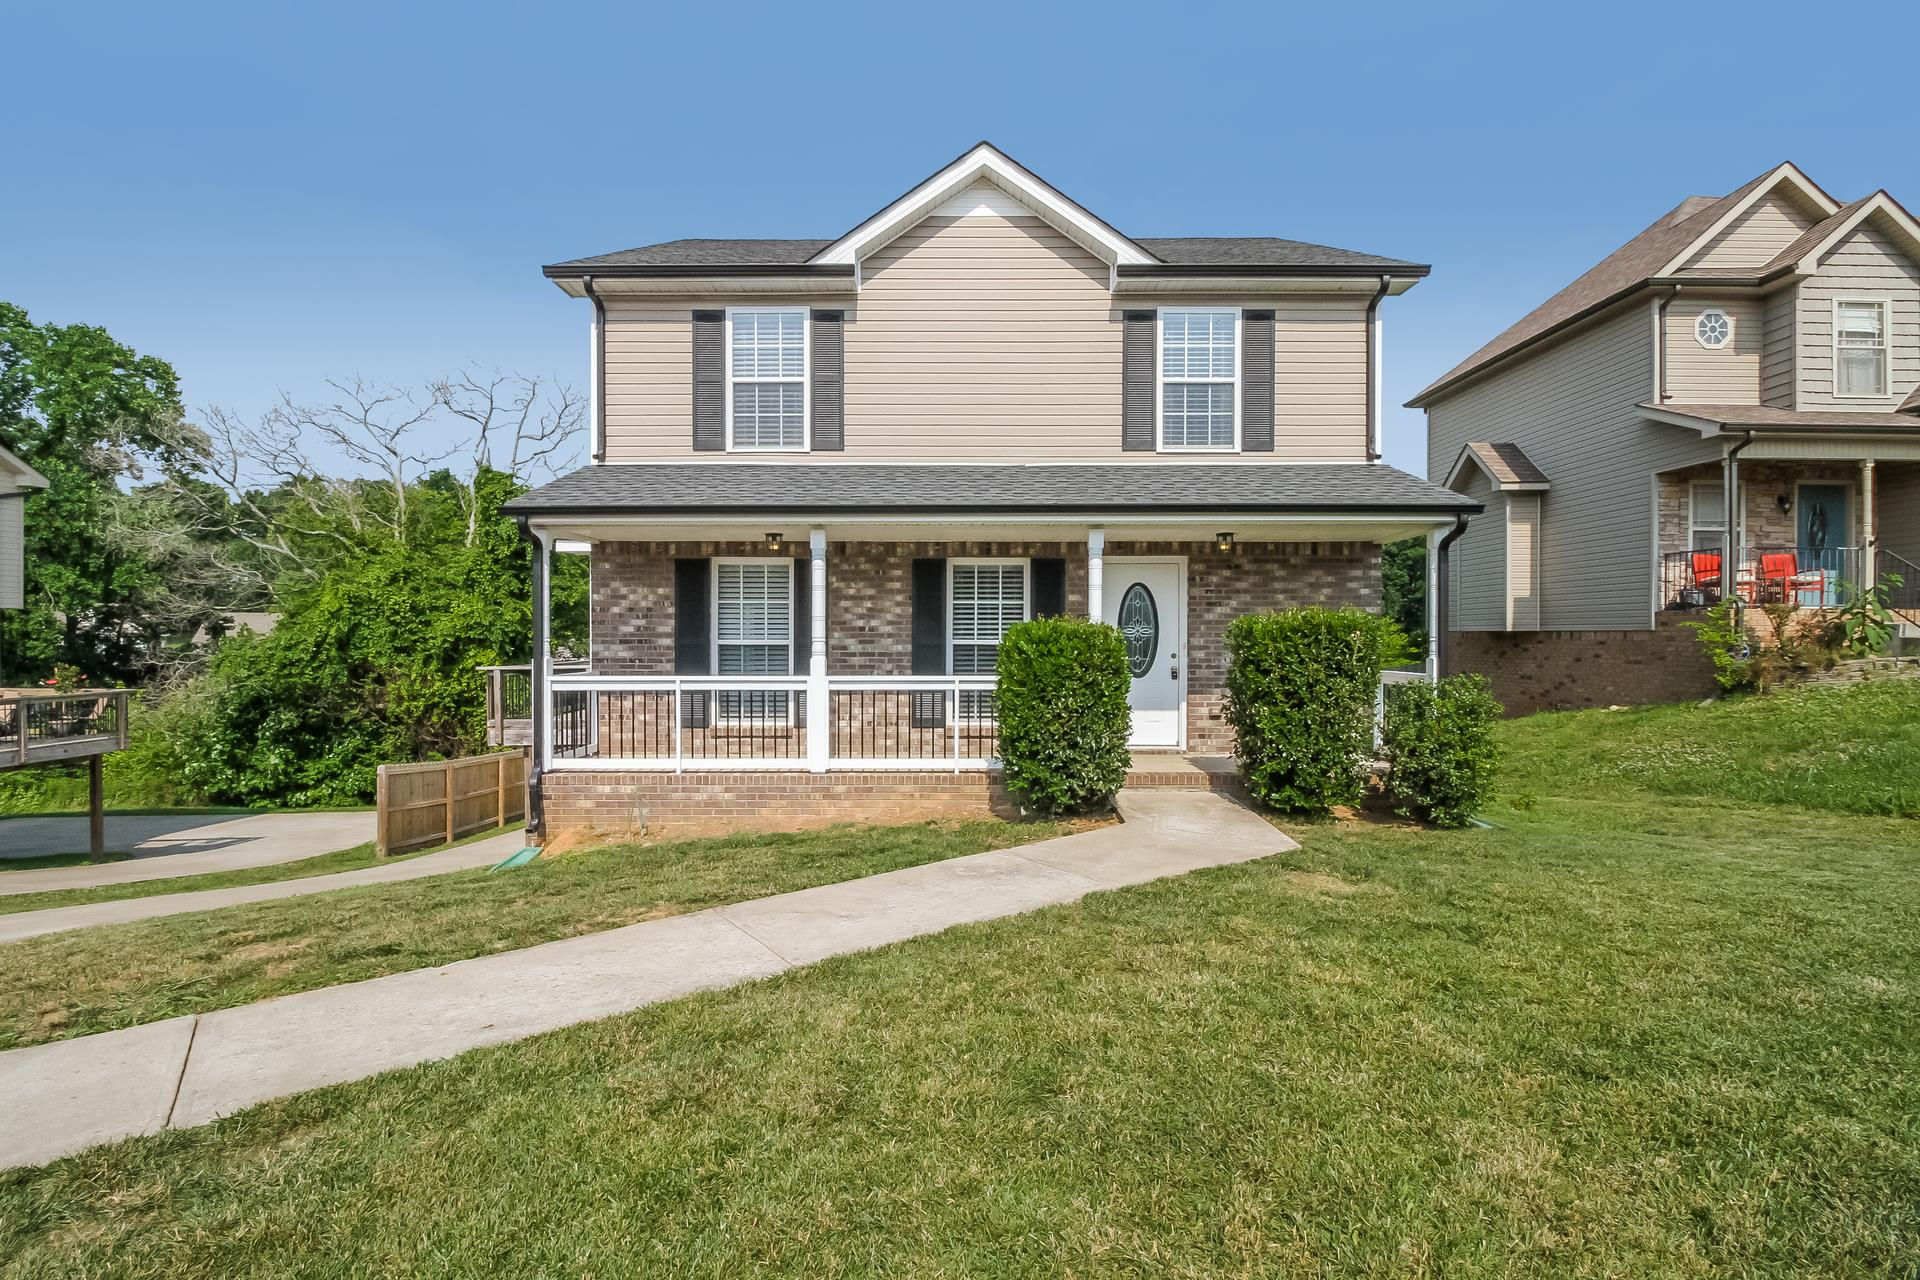 2664 Arthurs Ct, Clarksville, TN 37040 - Clarksville, TN real estate listing